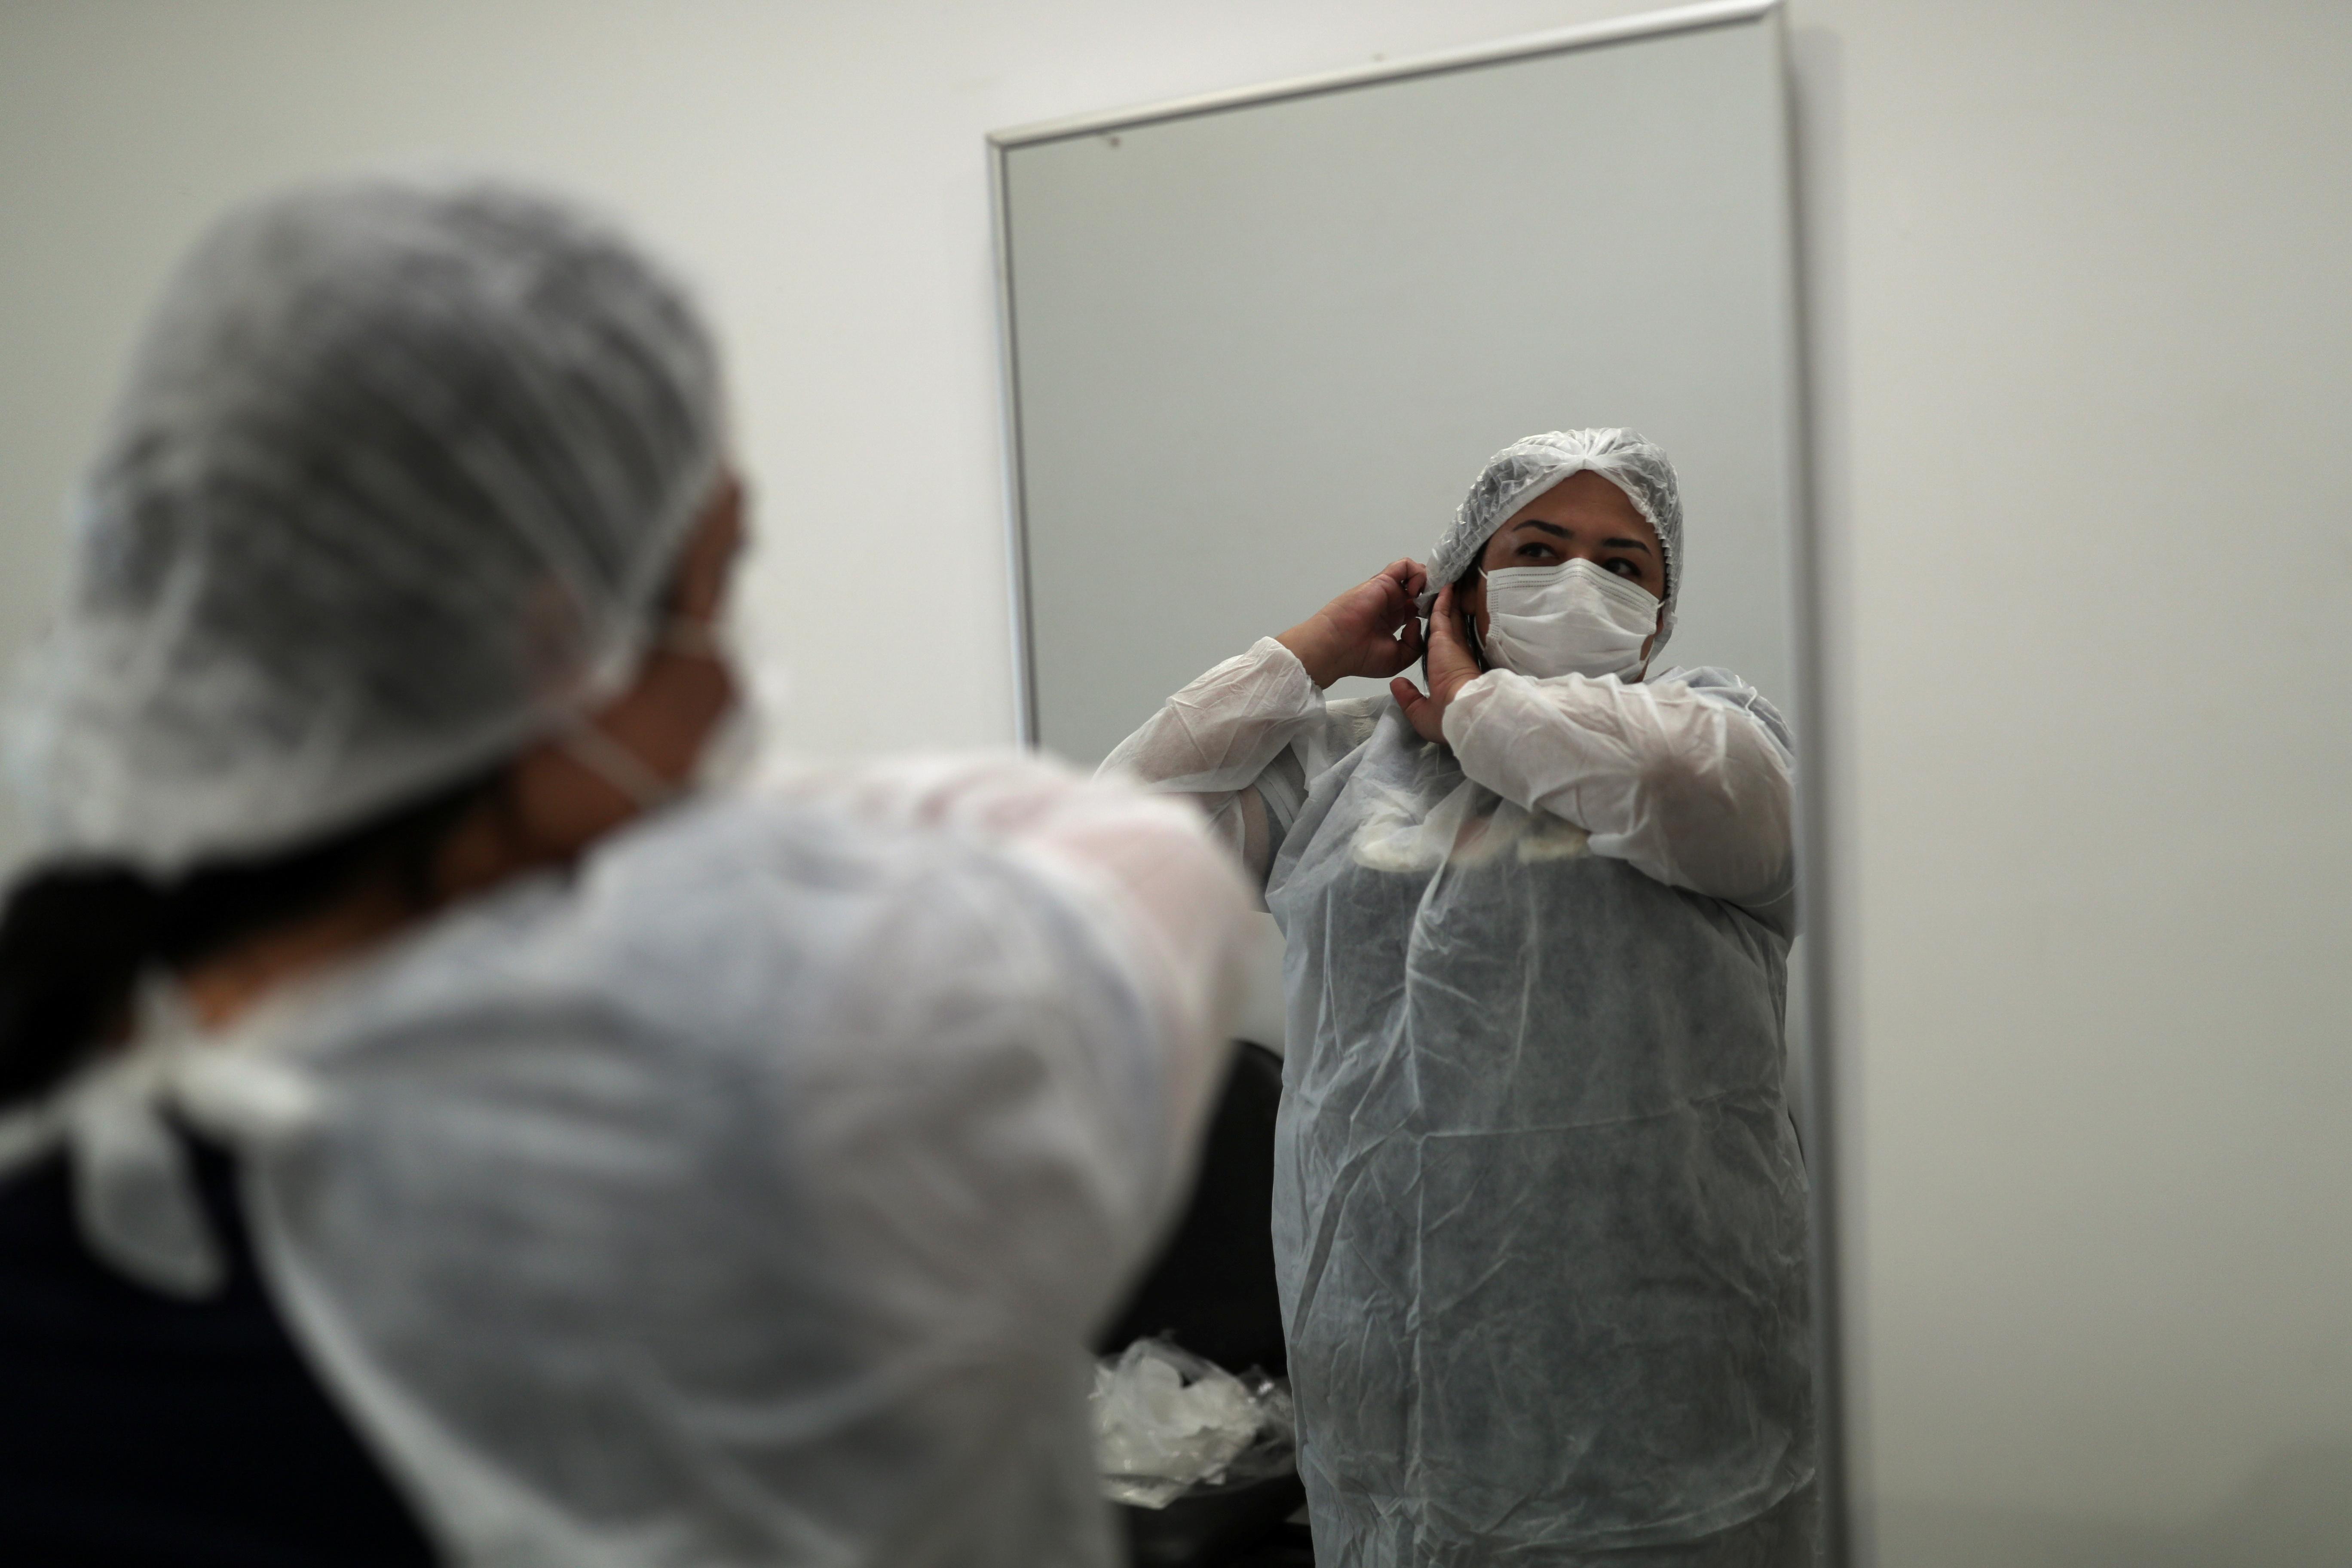 Nursing technician Semei Araujo Cunha prepares herself to enter the coronavirus disease (COVID-19) ward at a UPA (Emergency Service Unit) in Sao Carlos, Sao Paulo state, Brazil April 16, 2021. REUTERS/Amanda Perobelli